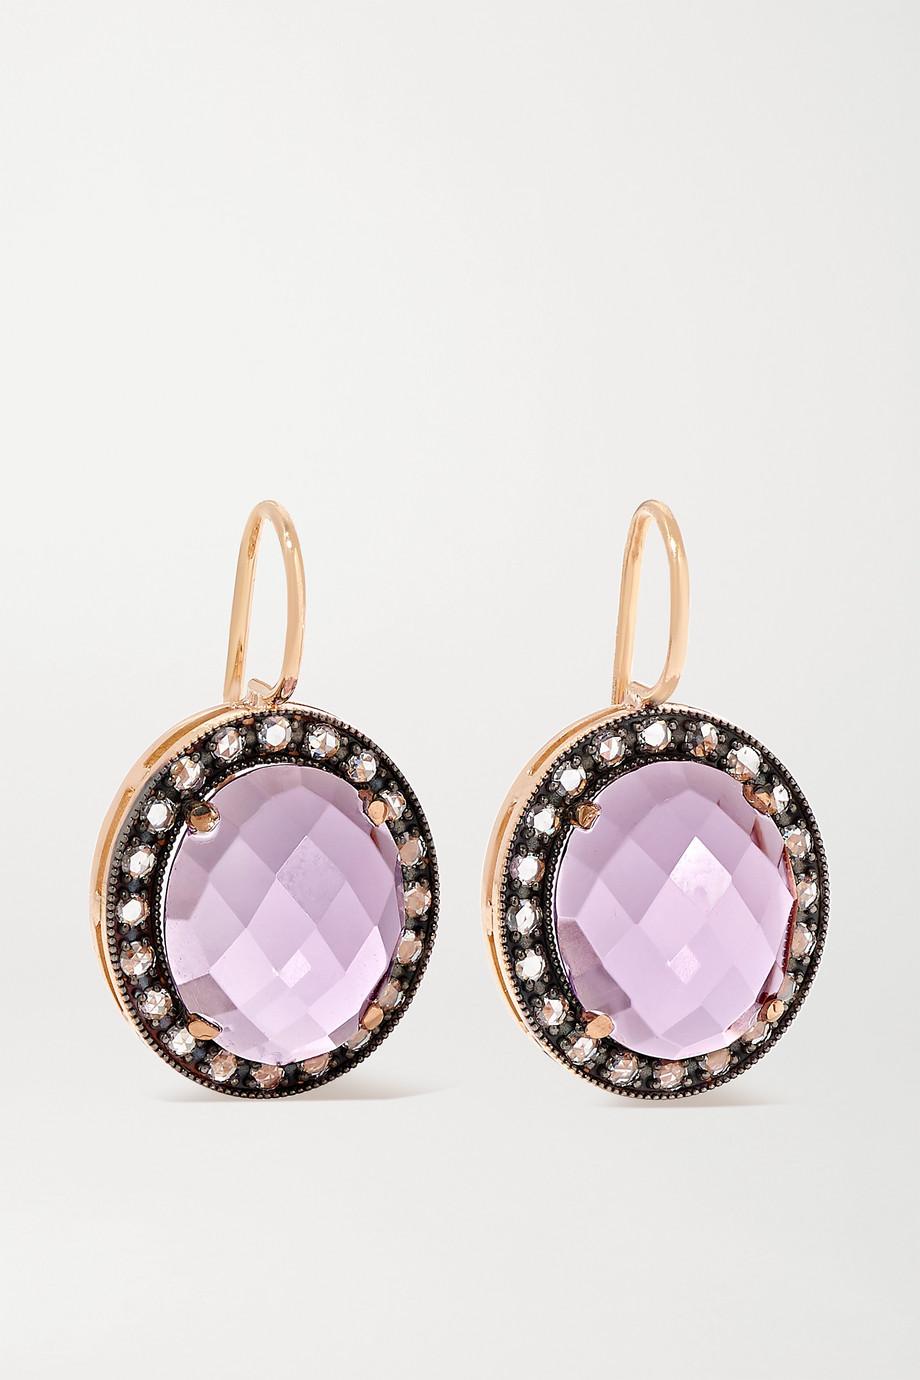 Andrea Fohrman 18-karat rose gold, amethyst and diamond earrings